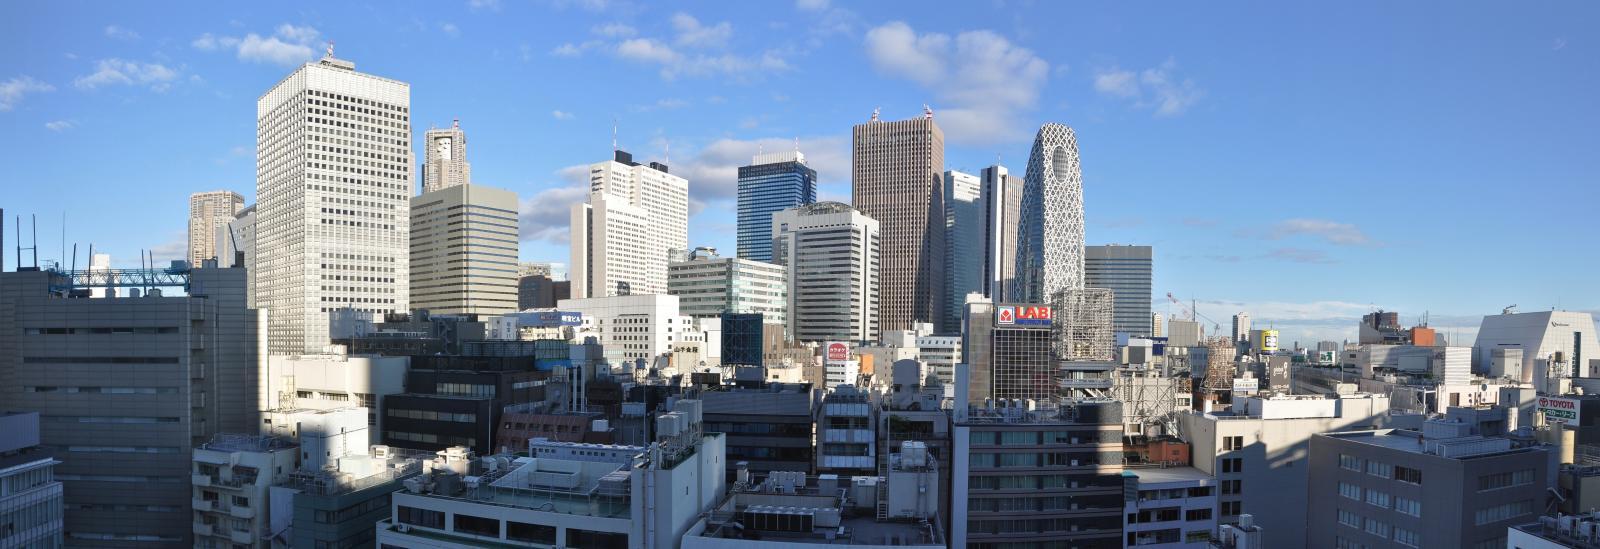 Skyline Tokyo Photographer: B.Bampbell, Source: Flickr